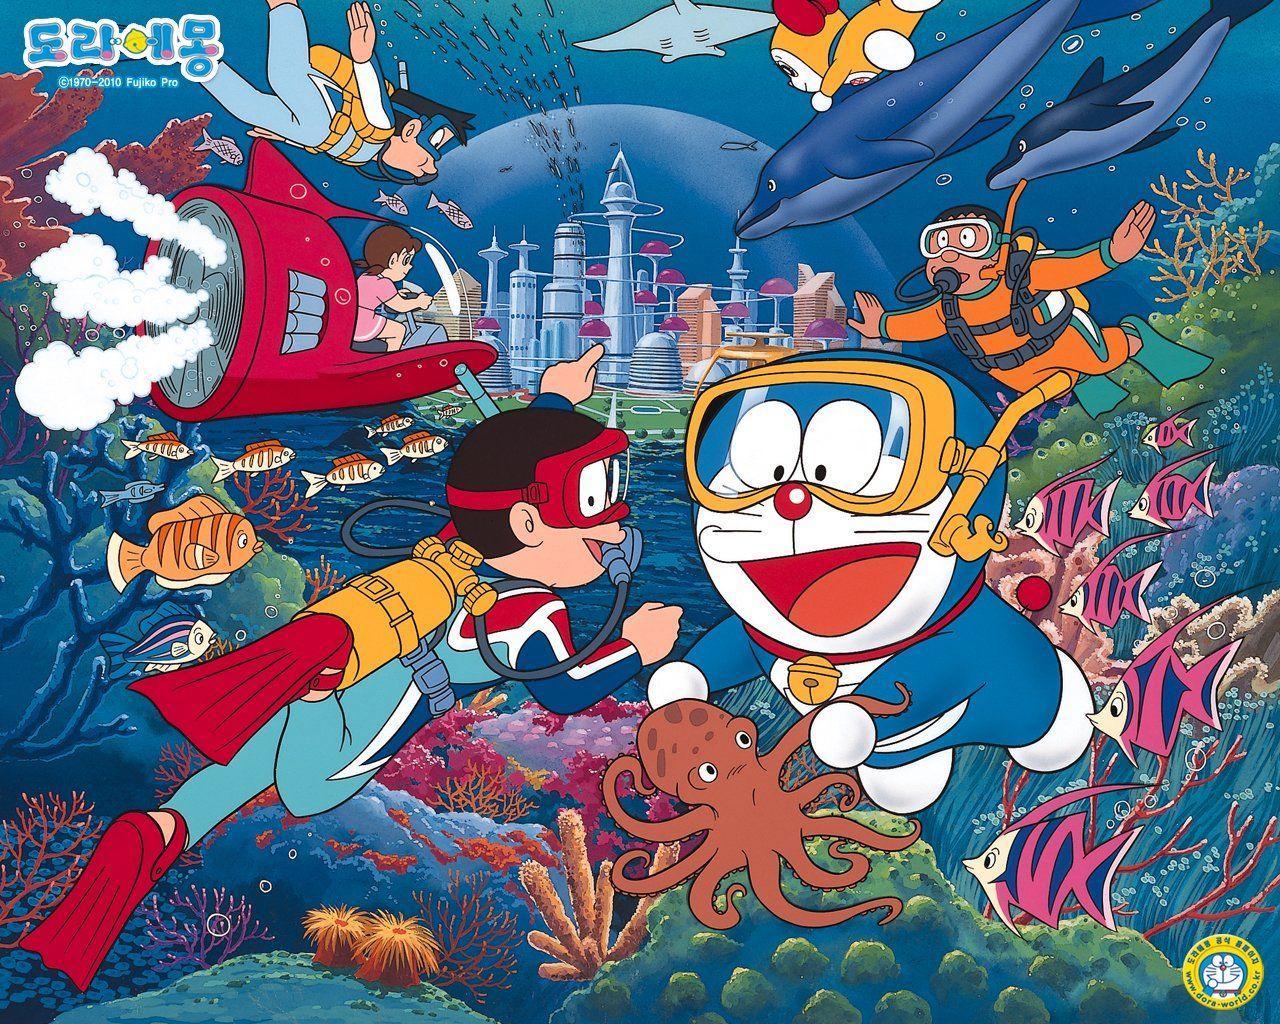 Doraemon Movie Wallpapers - Wallpaper Cave